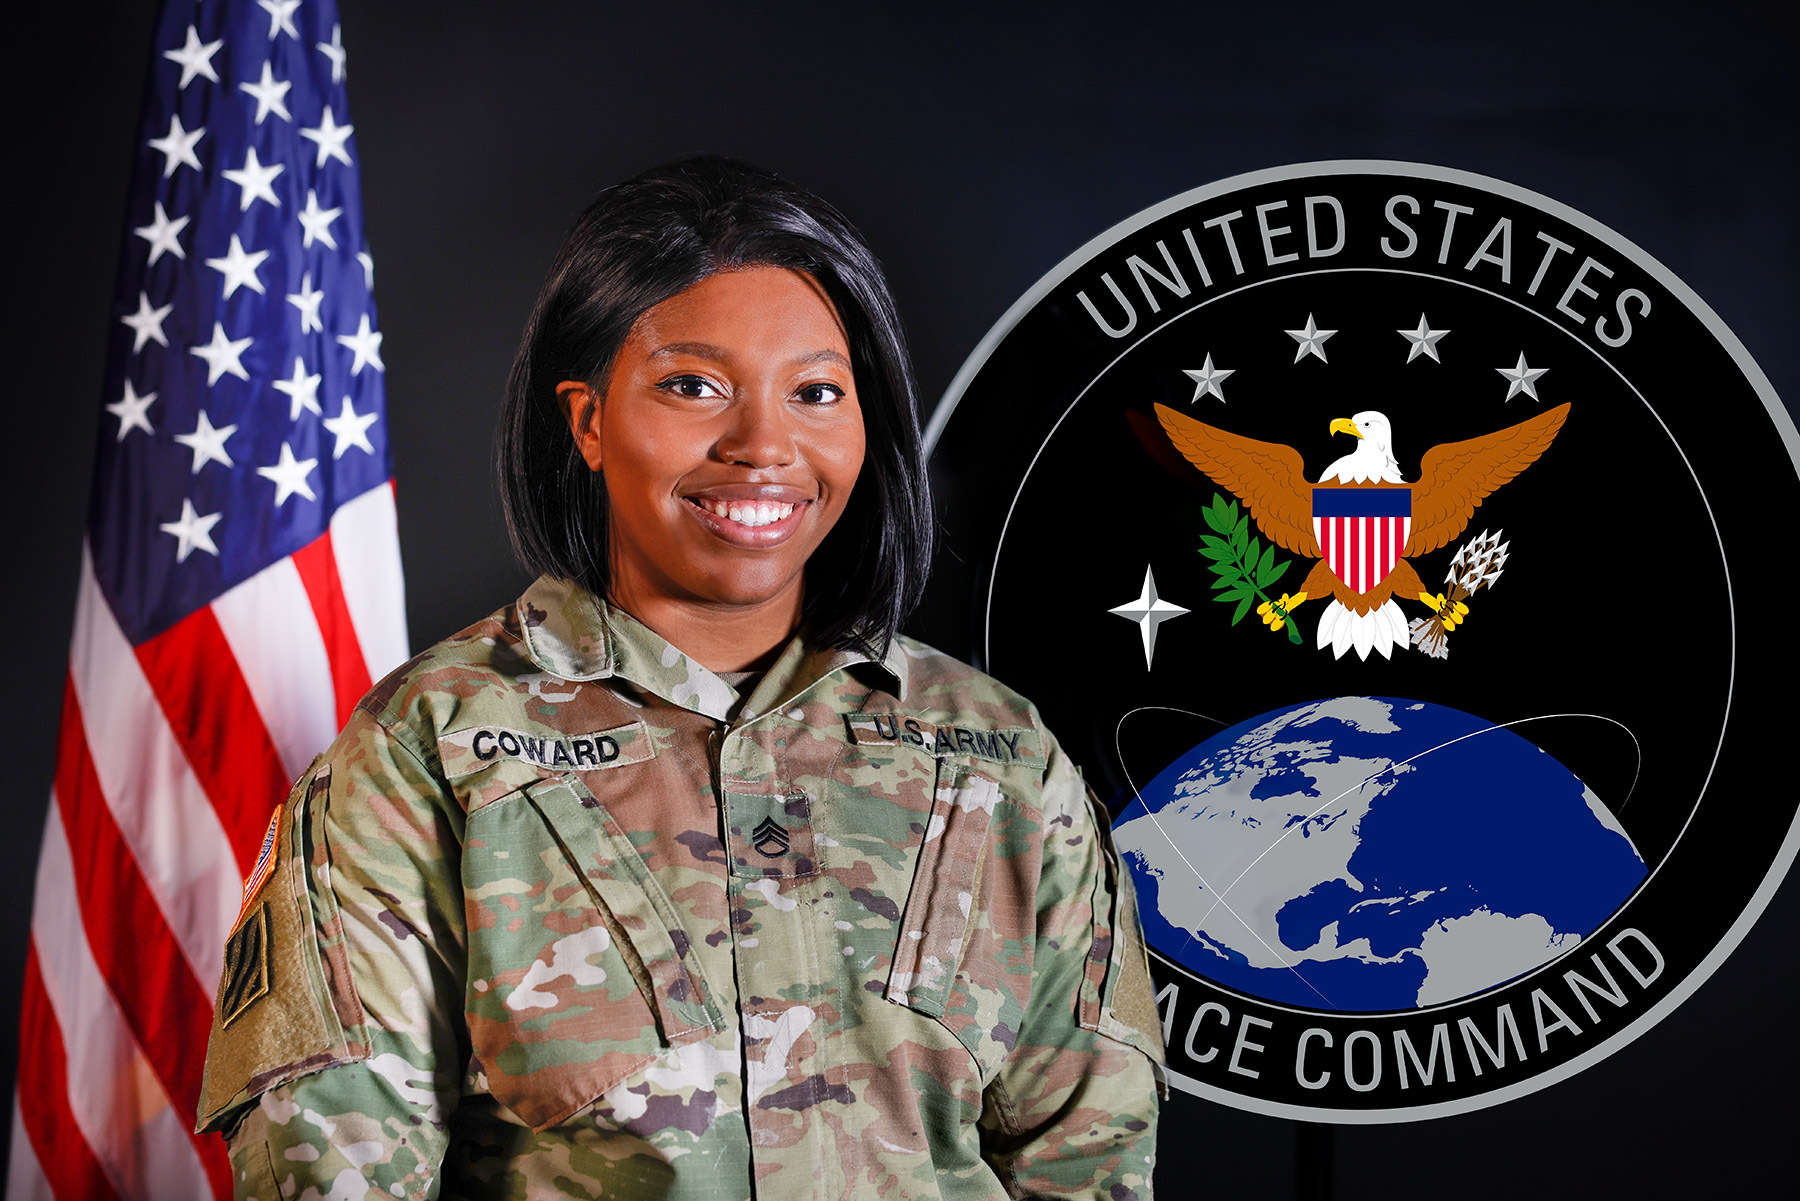 USSPACECOM Equal Opportunity Coordinator